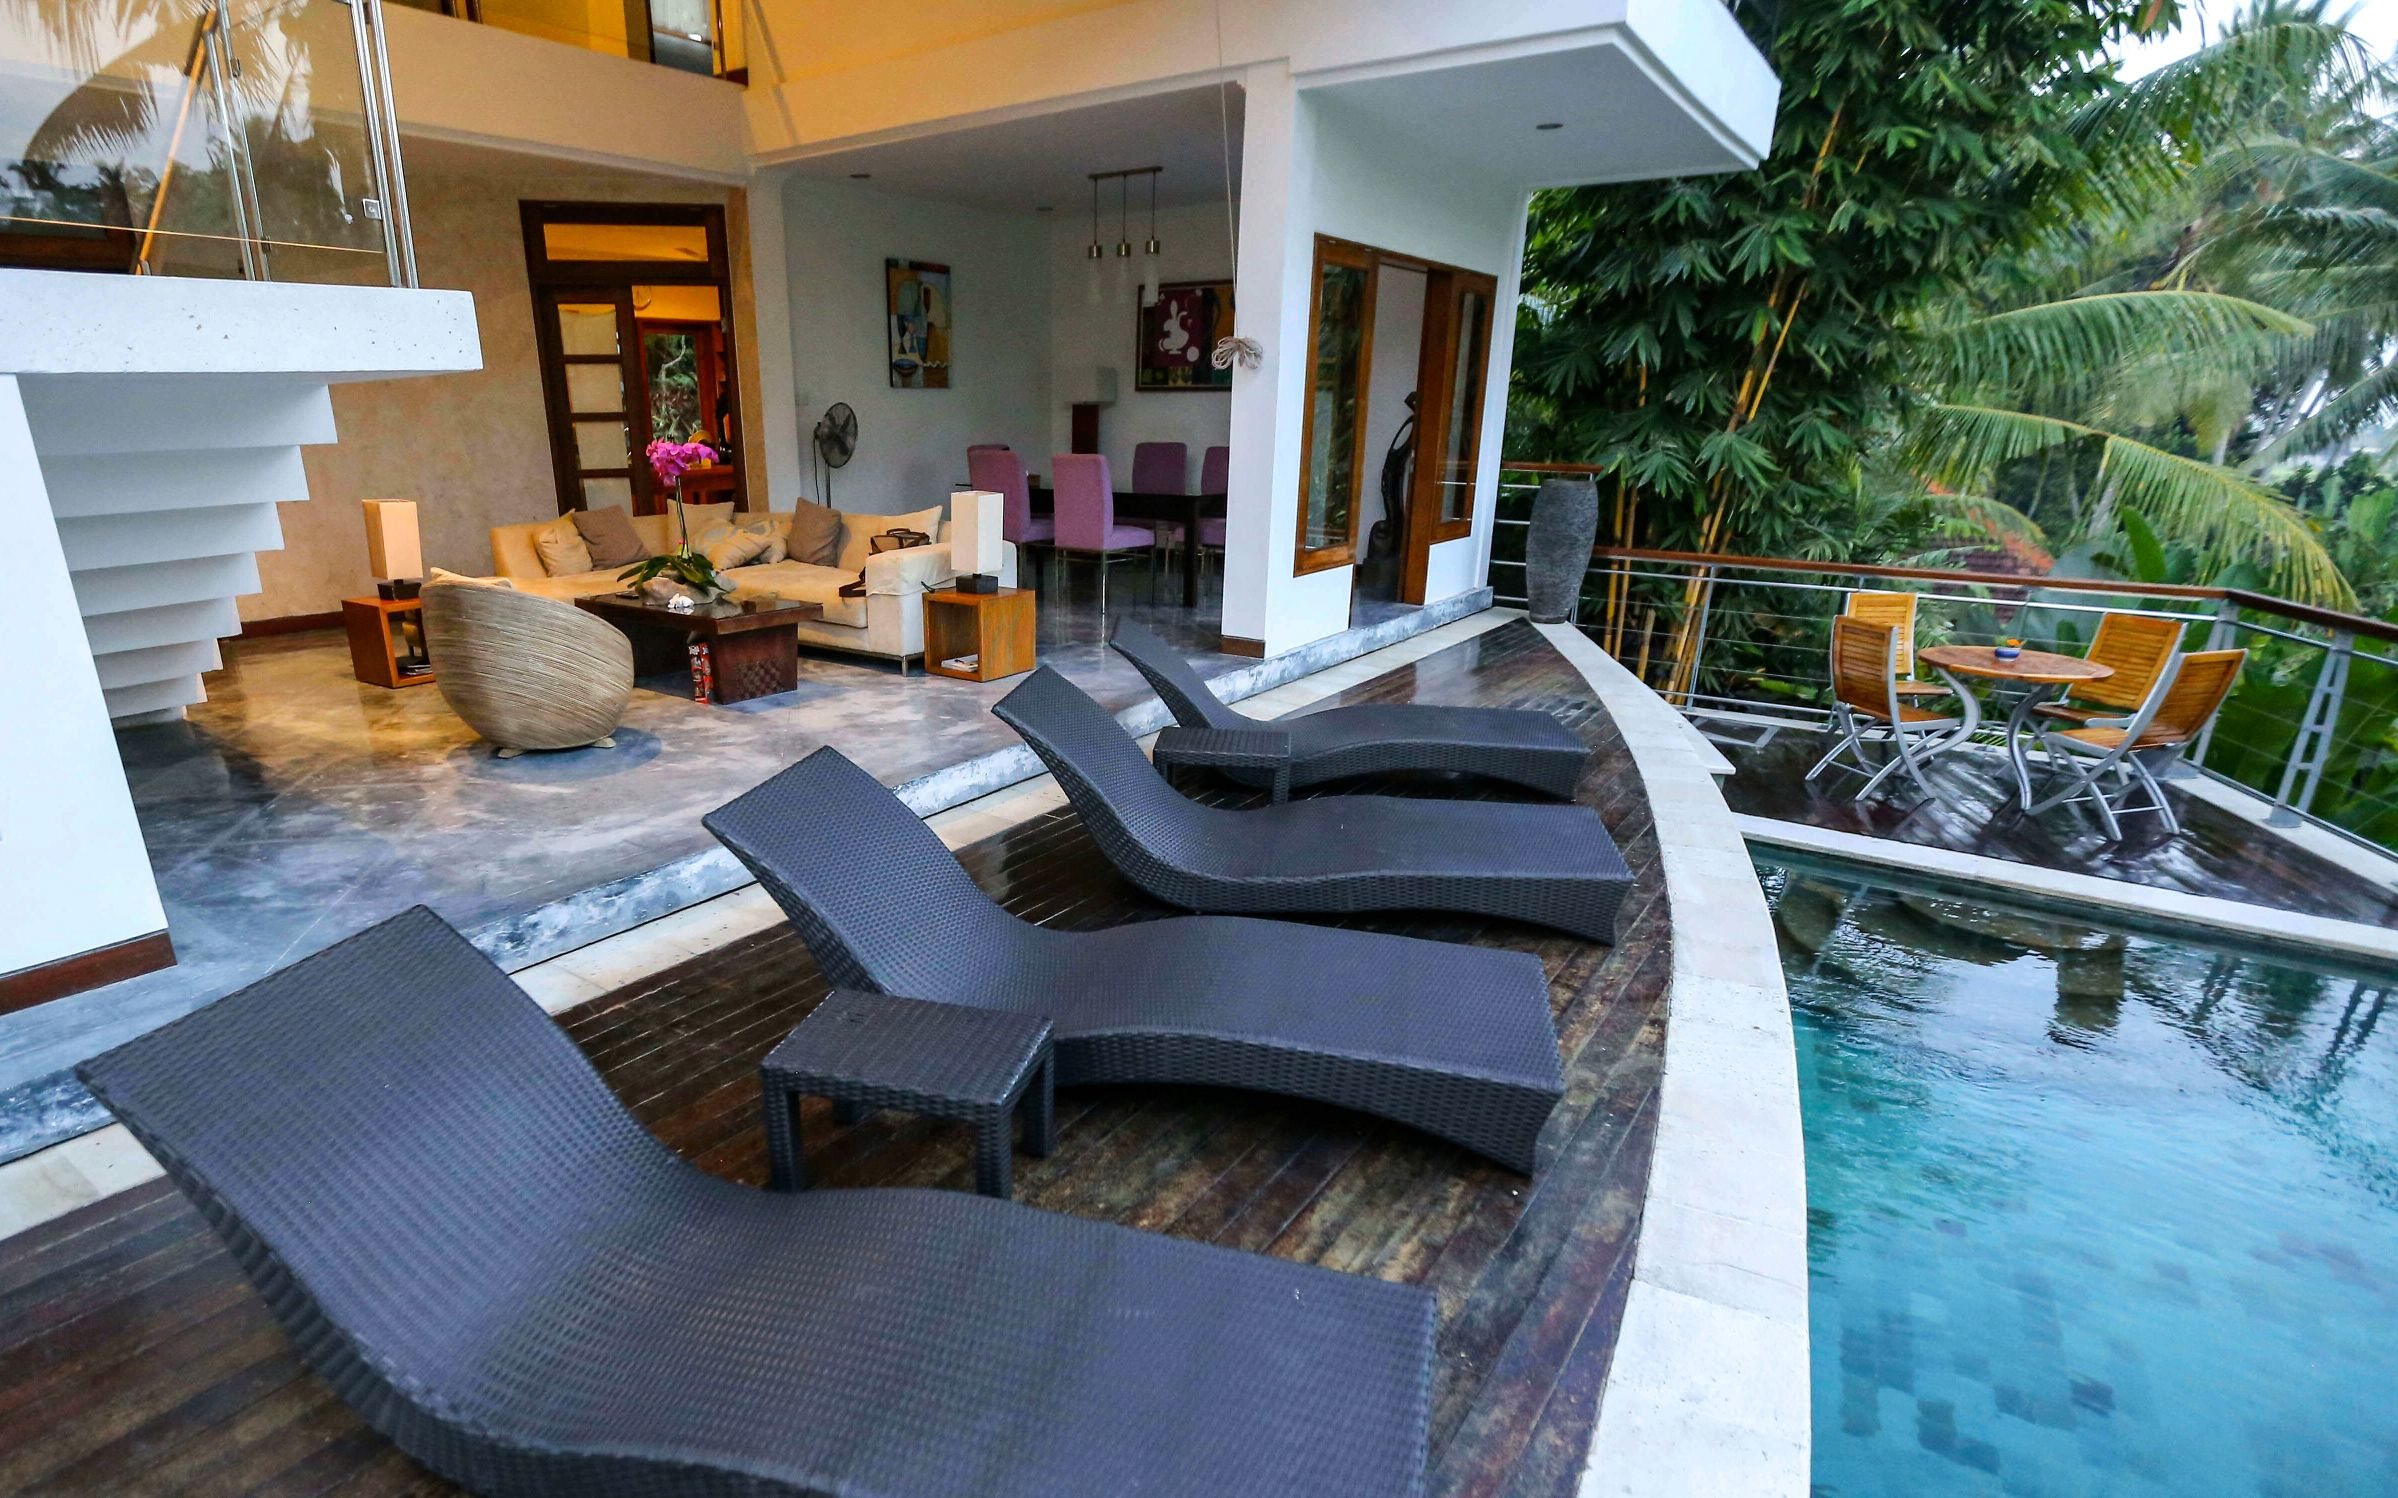 Living Room and Pool Photo